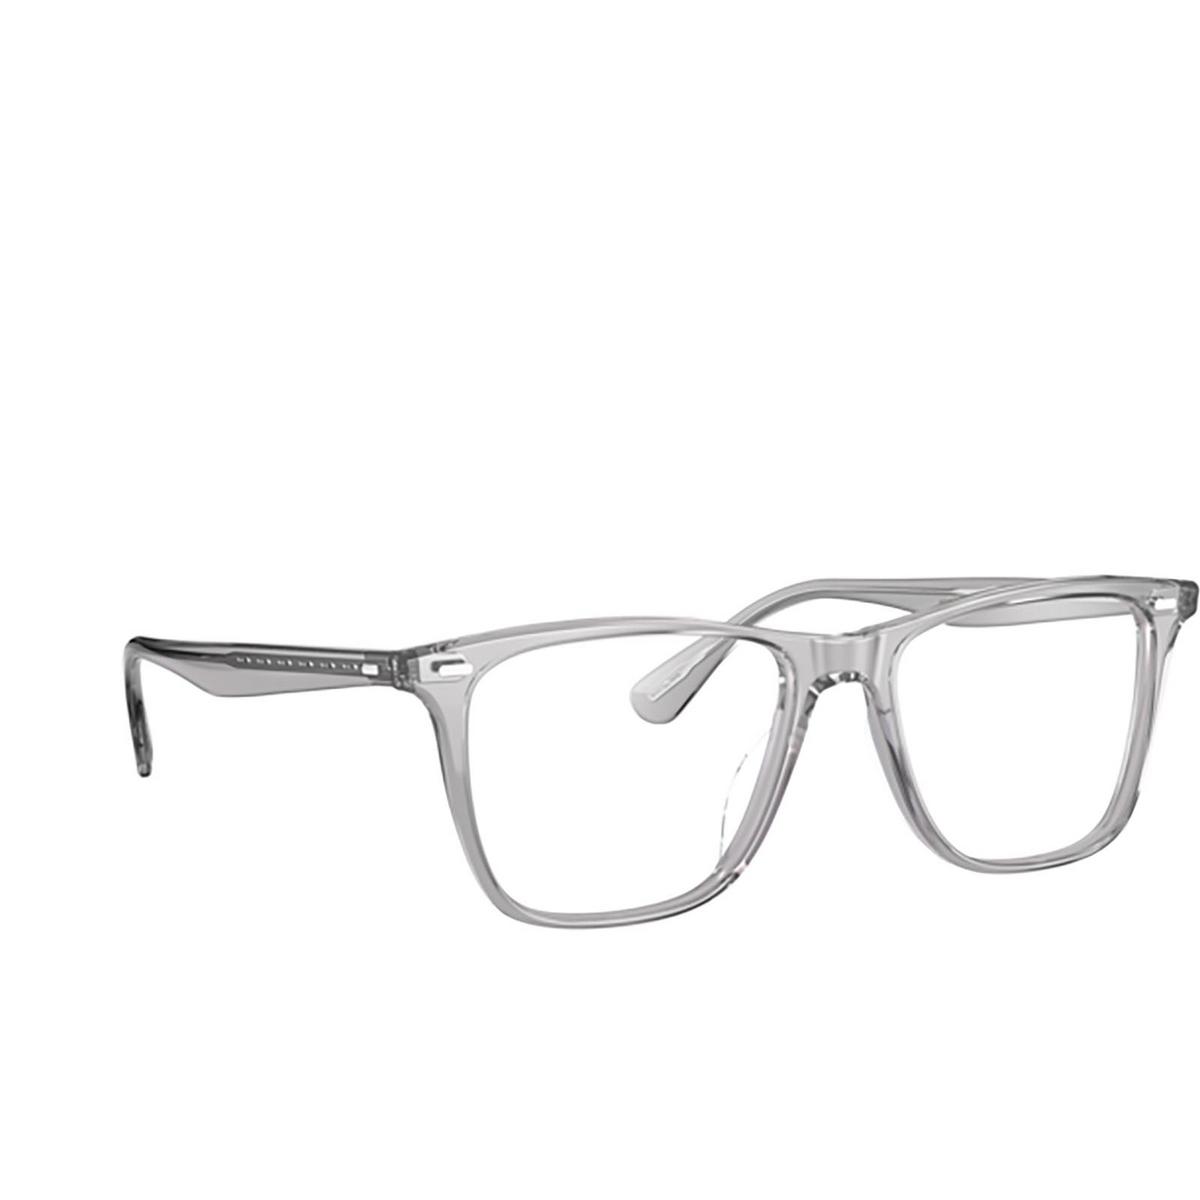 Oliver Peoples® Square Eyeglasses: Ollis OV5437U color Workman Grey 1132 - three-quarters view.